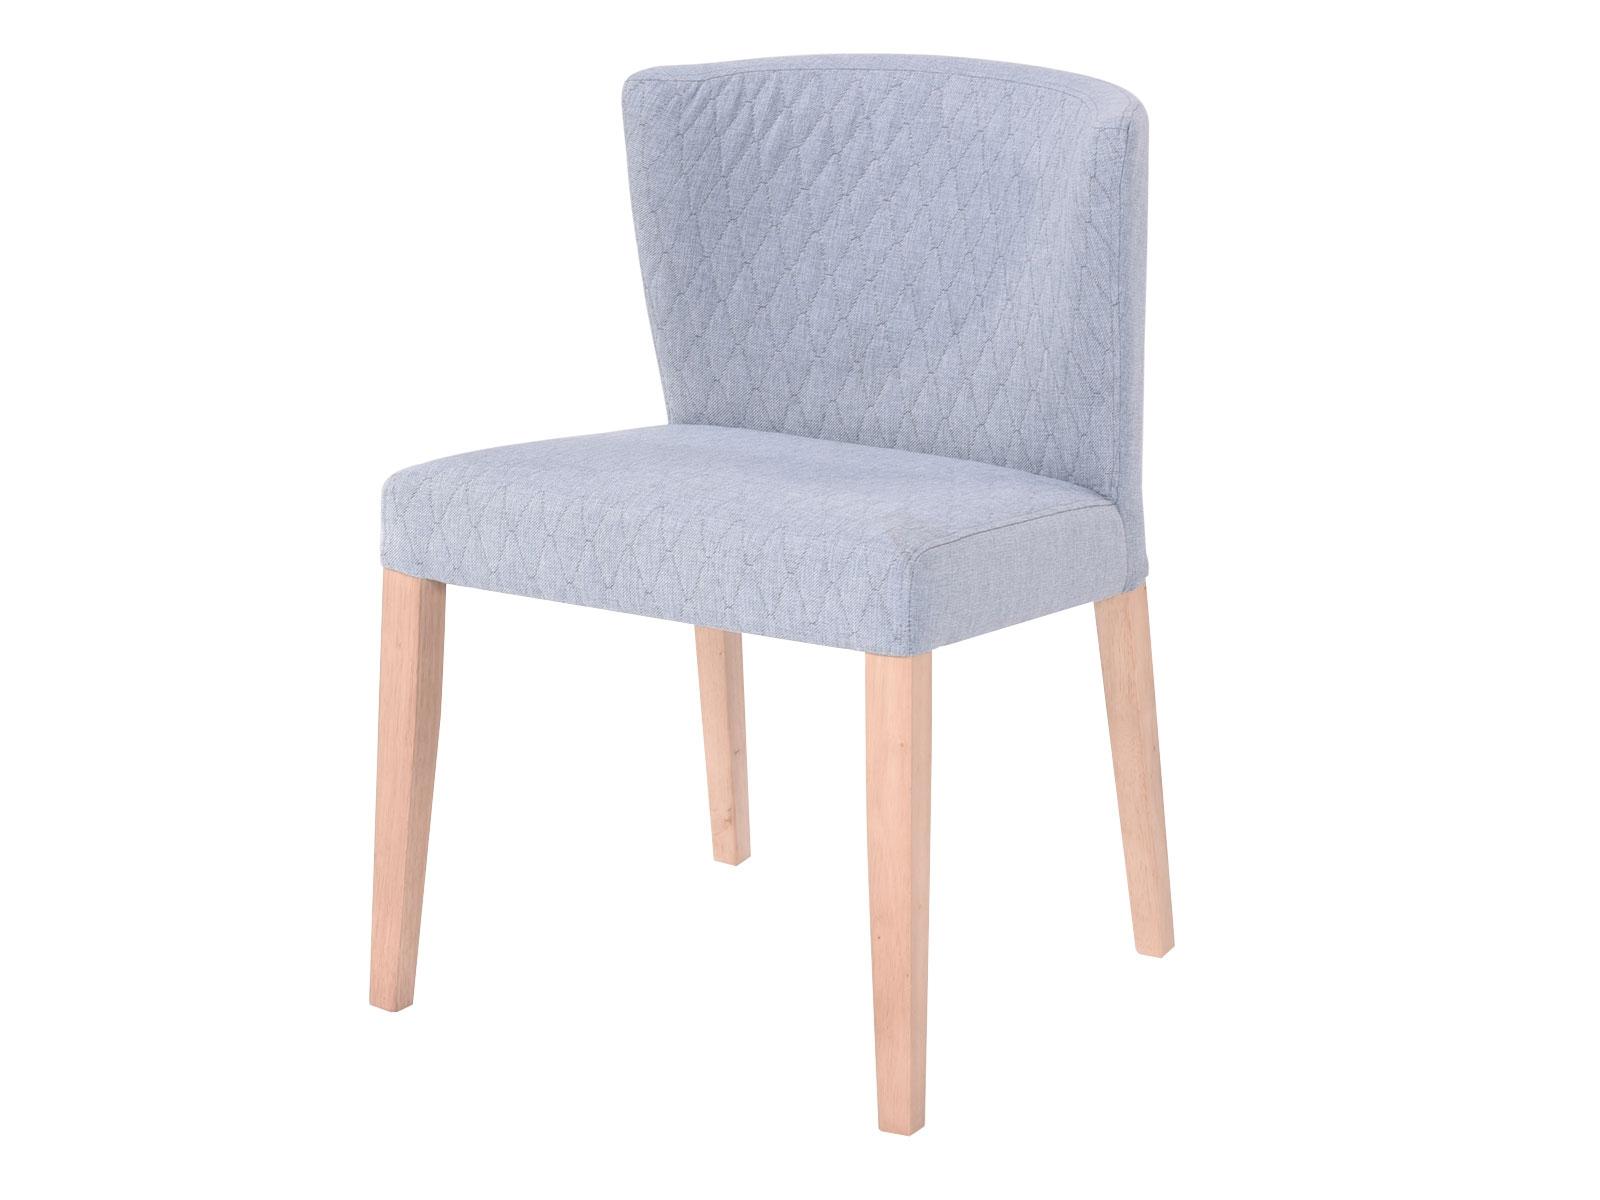 Scaun din lemn tapitat cu stofa Lara l52xA49xH78 cm